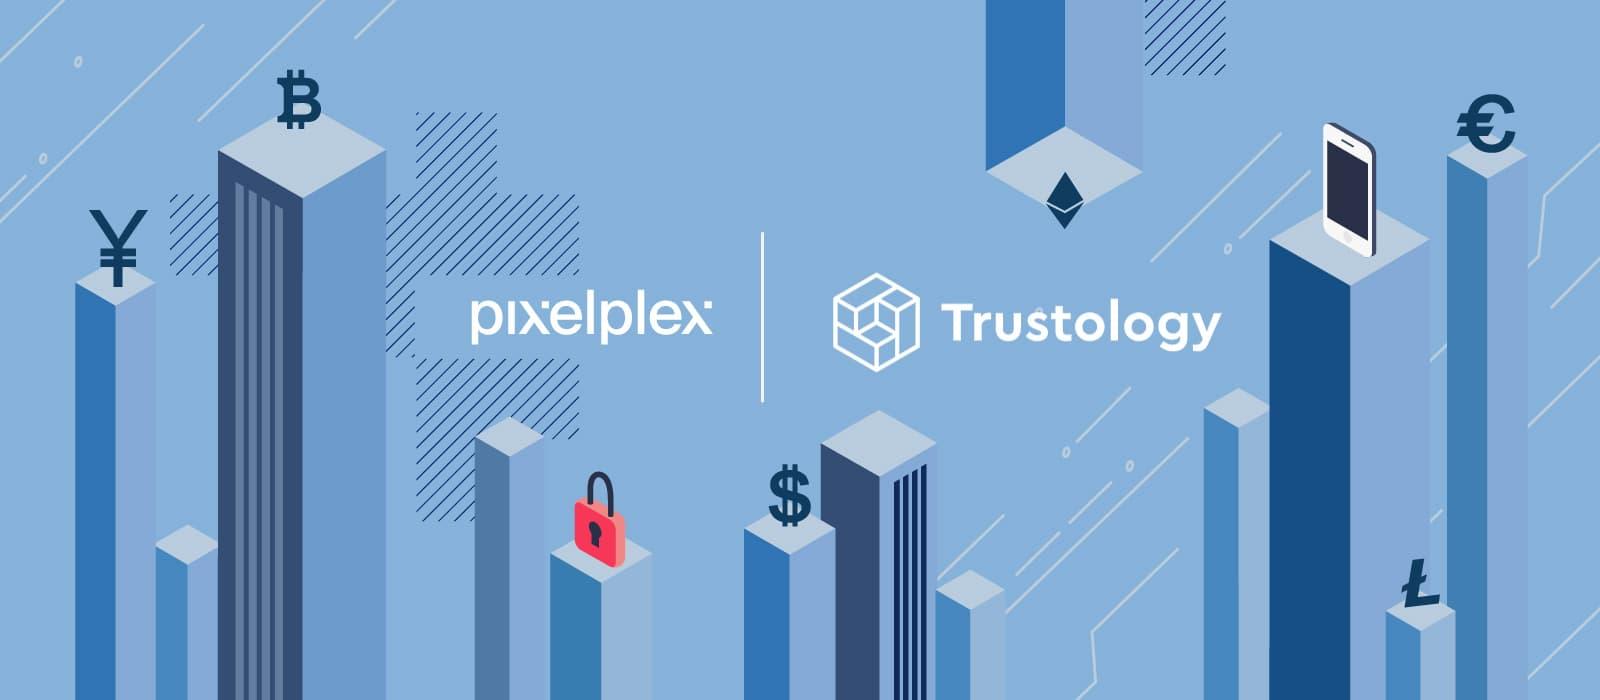 PixelPlex Announces Partnership with Institutional Crypto Custodian Trustology